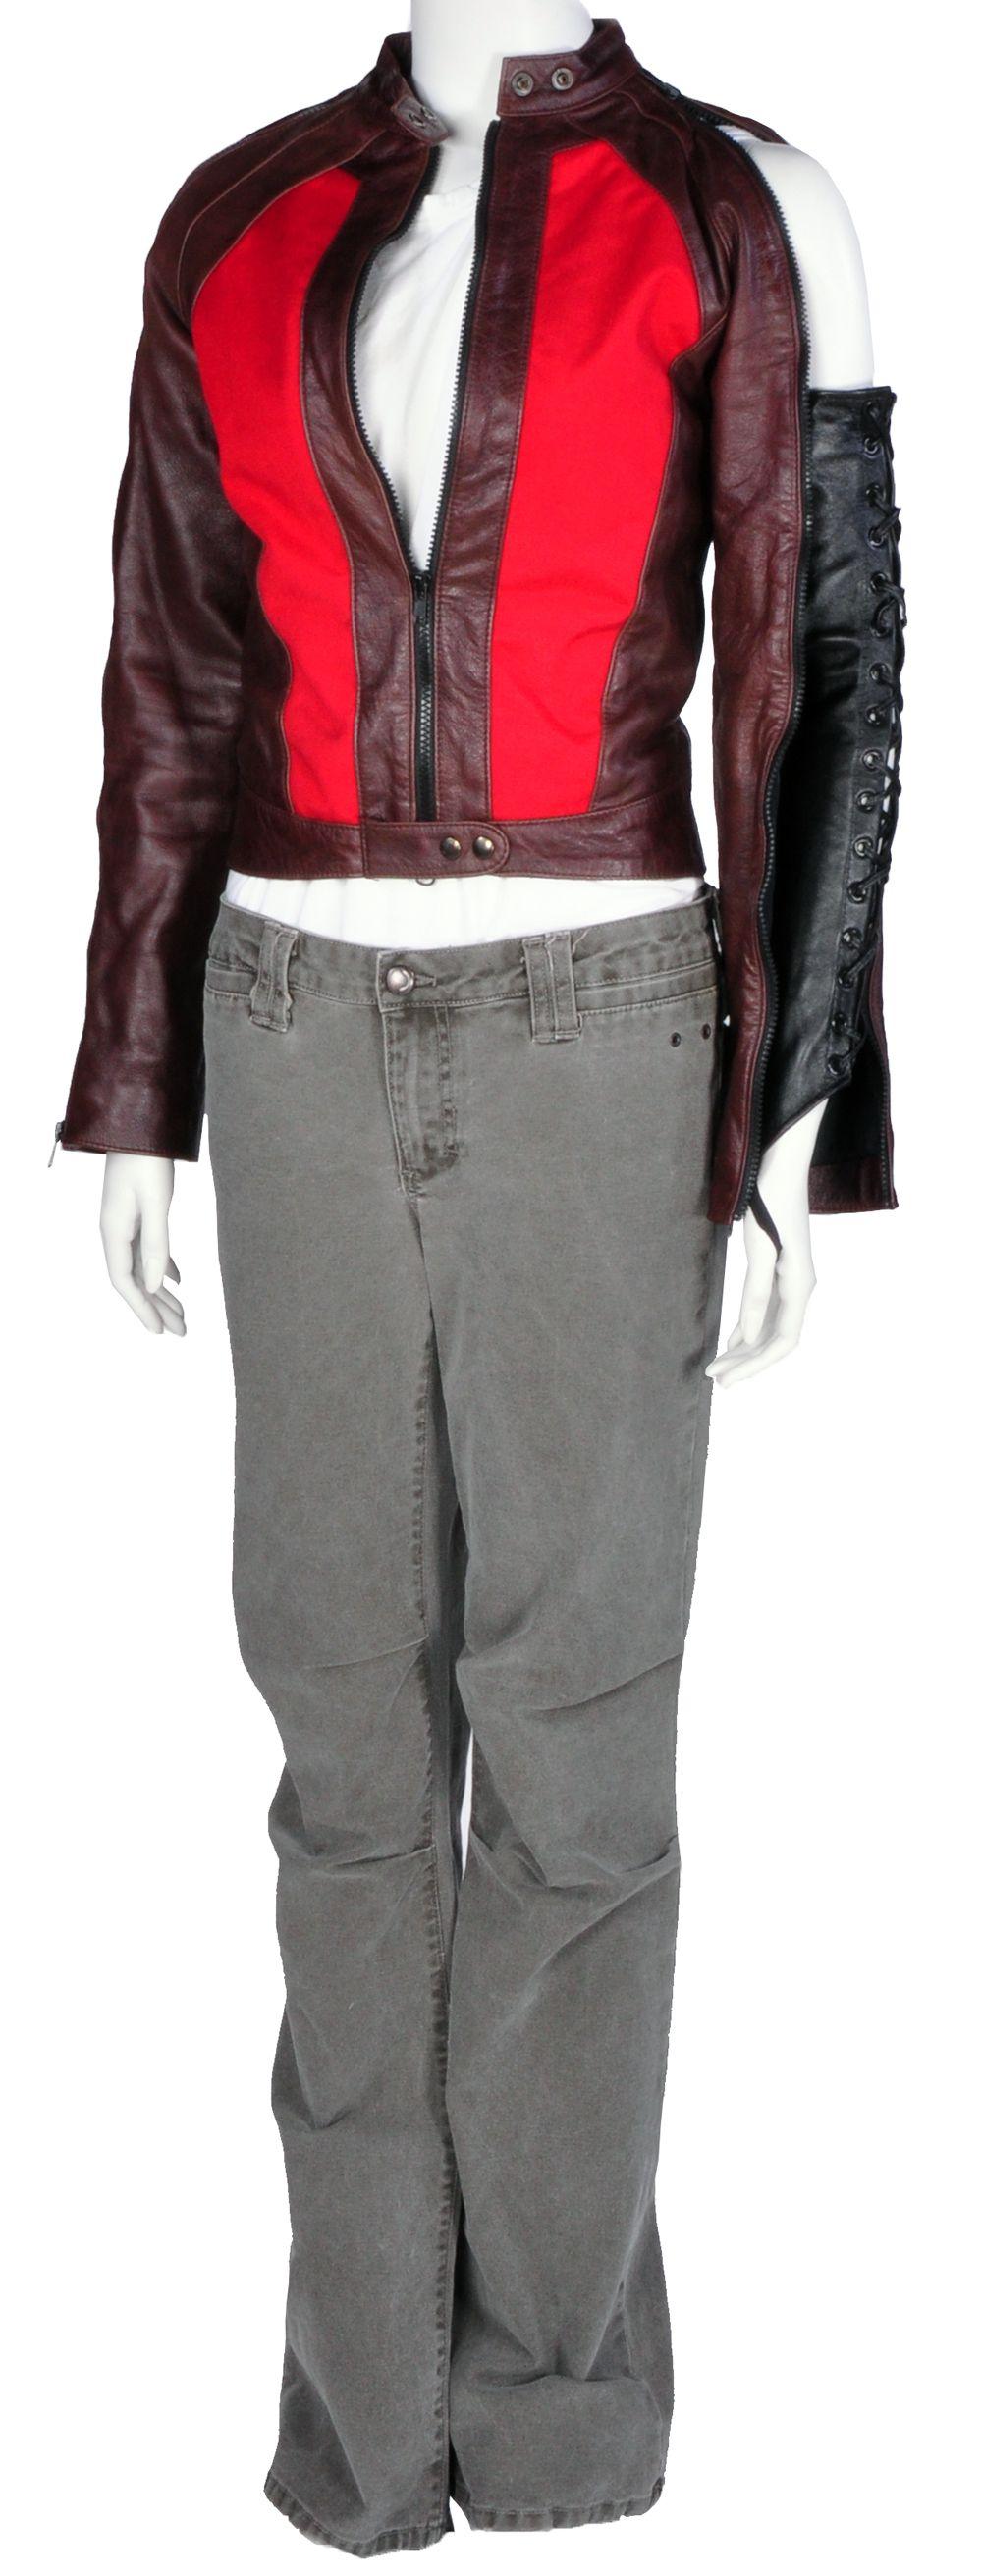 Jessica Biel Blade Trinity costume